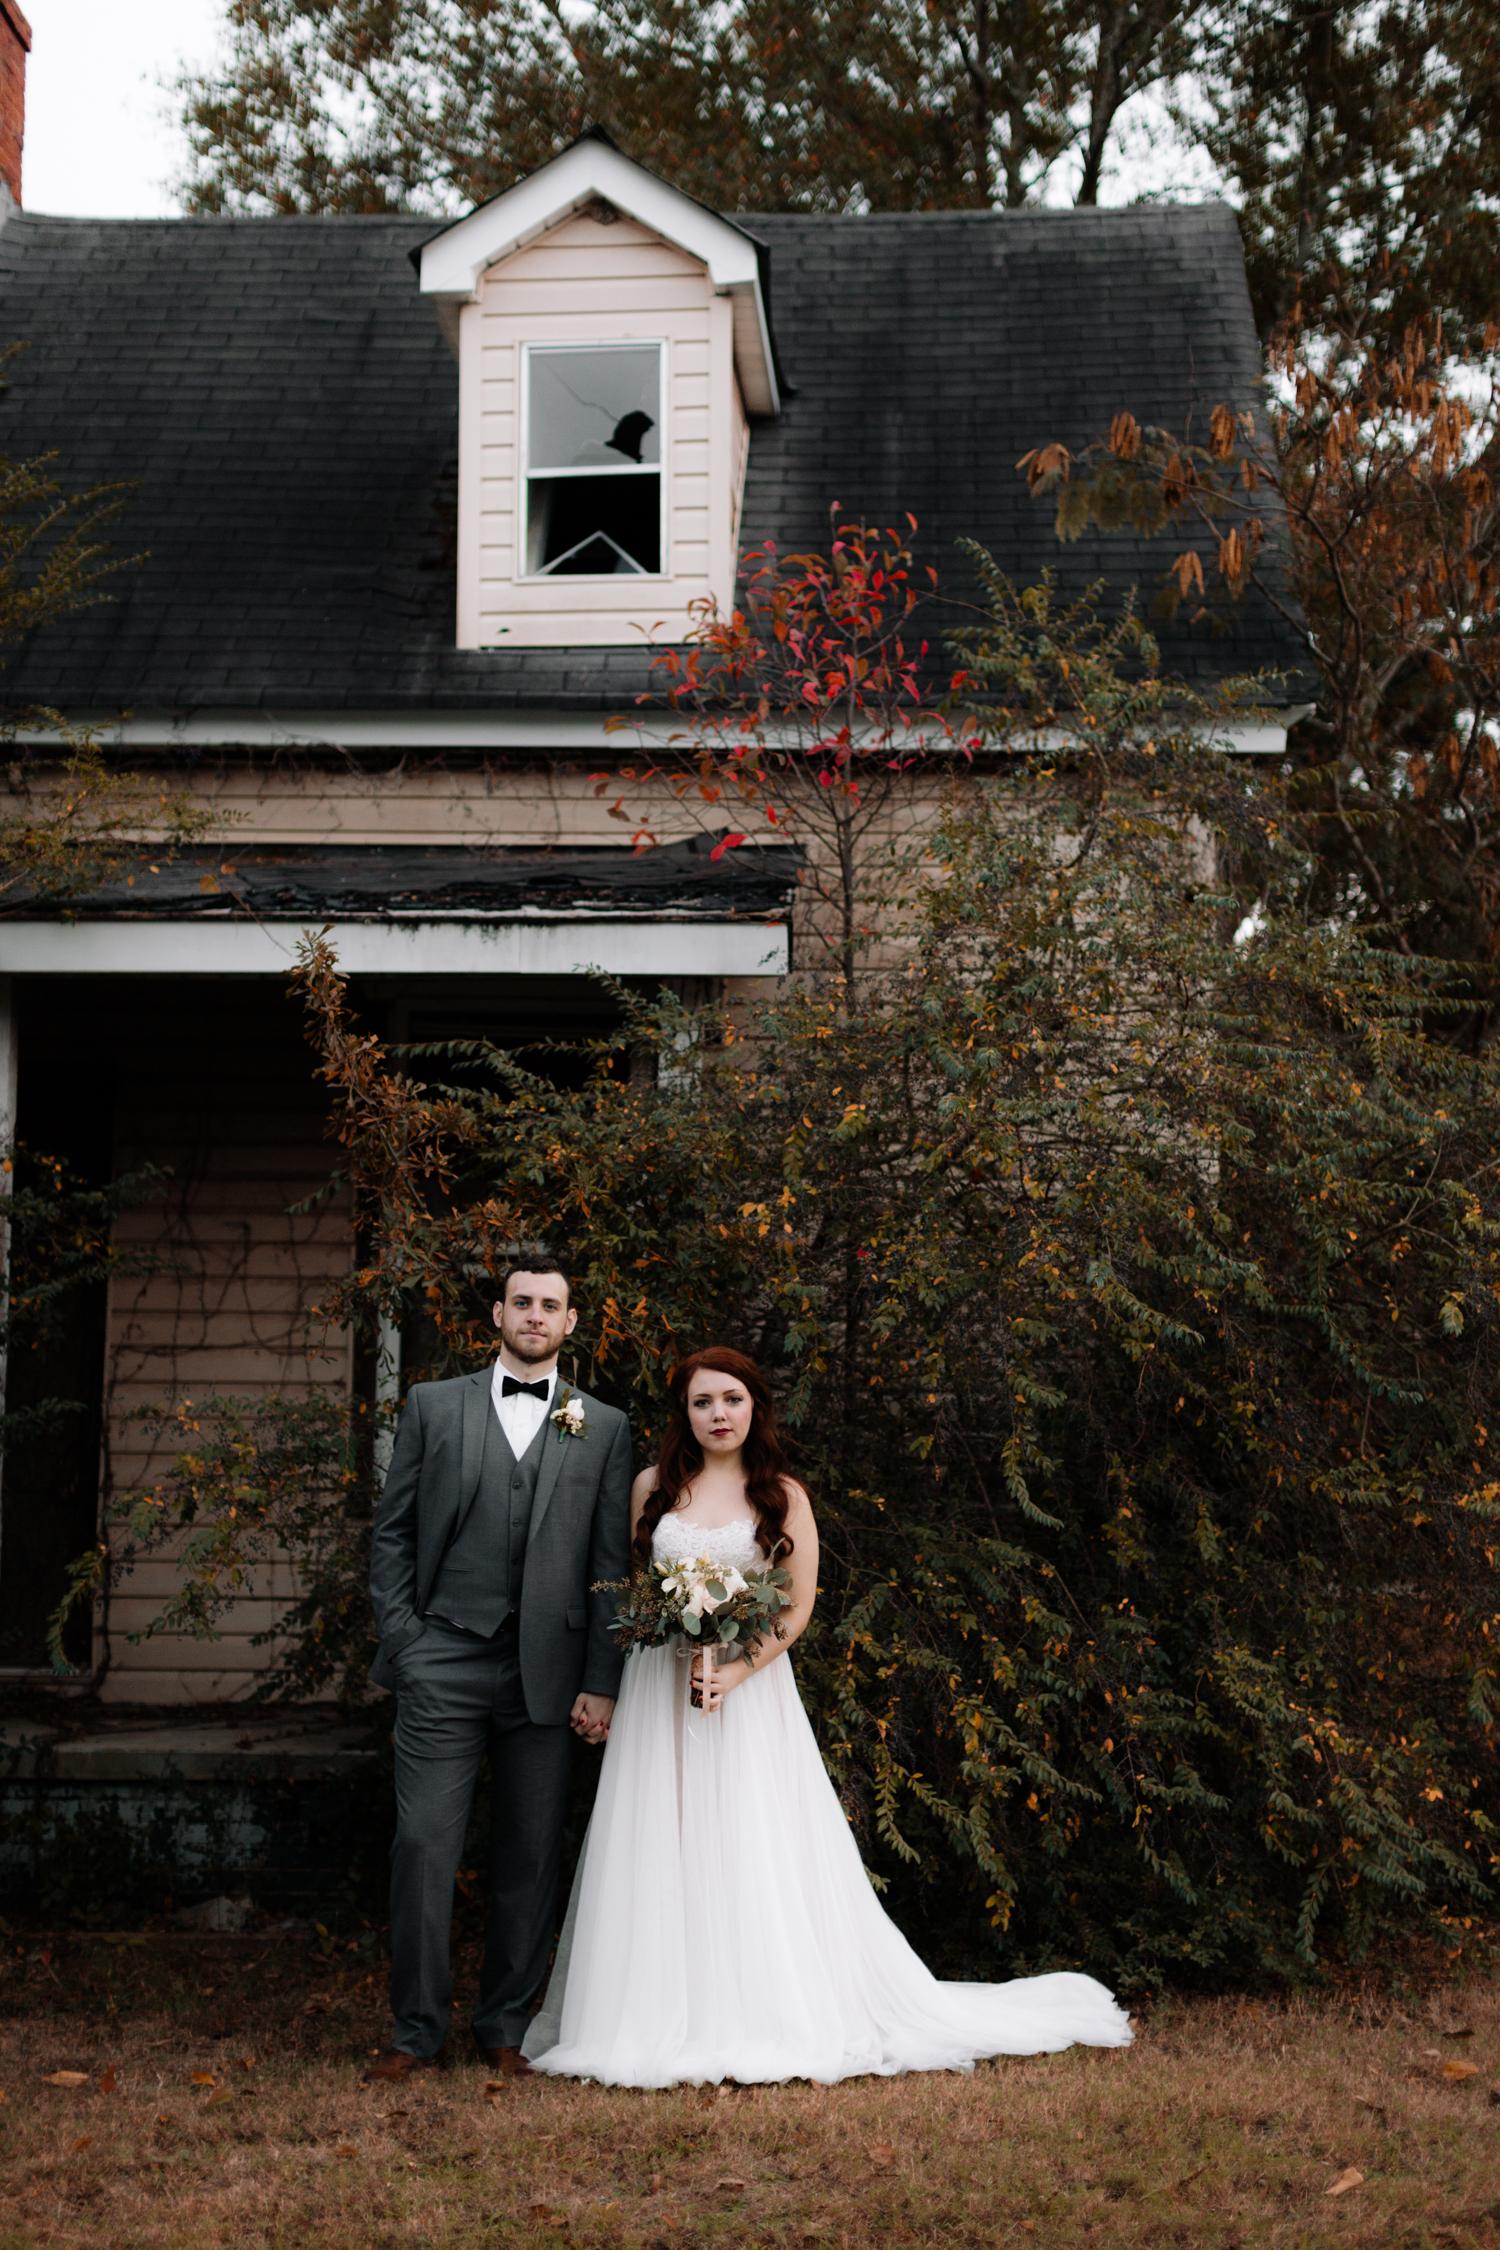 Yellow+Bird+Visuals+Destination+Wedding+Photographer-7650